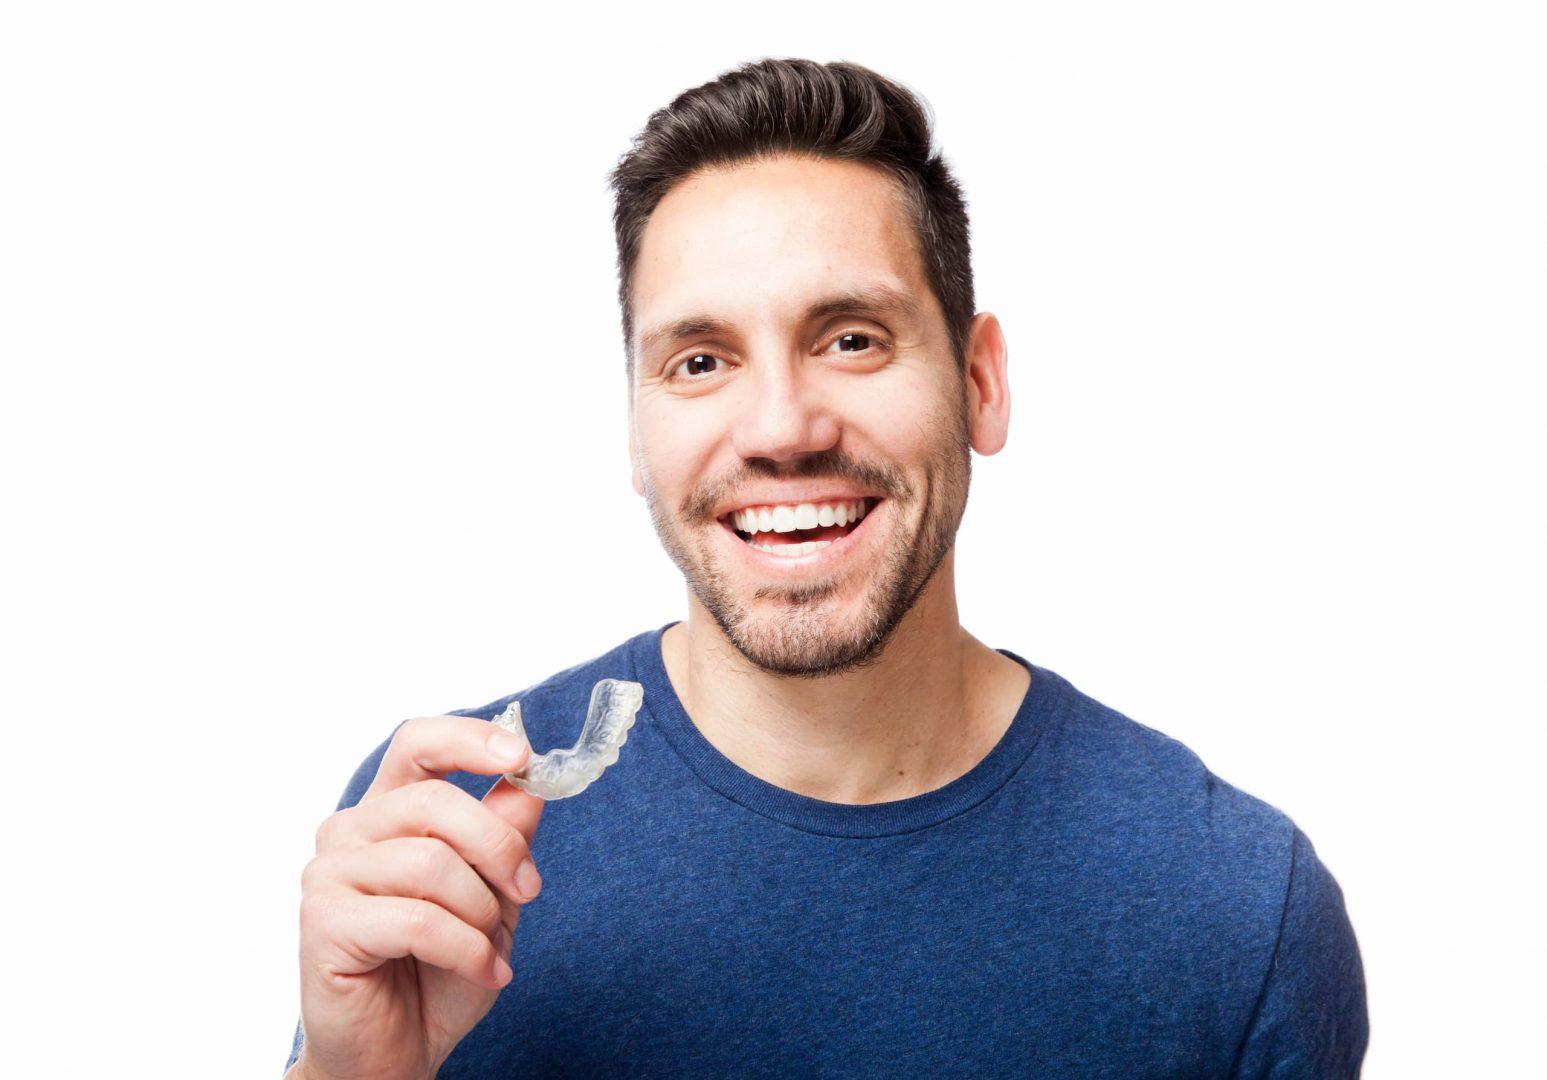 Homme souriant tenant sa plaque occlusale